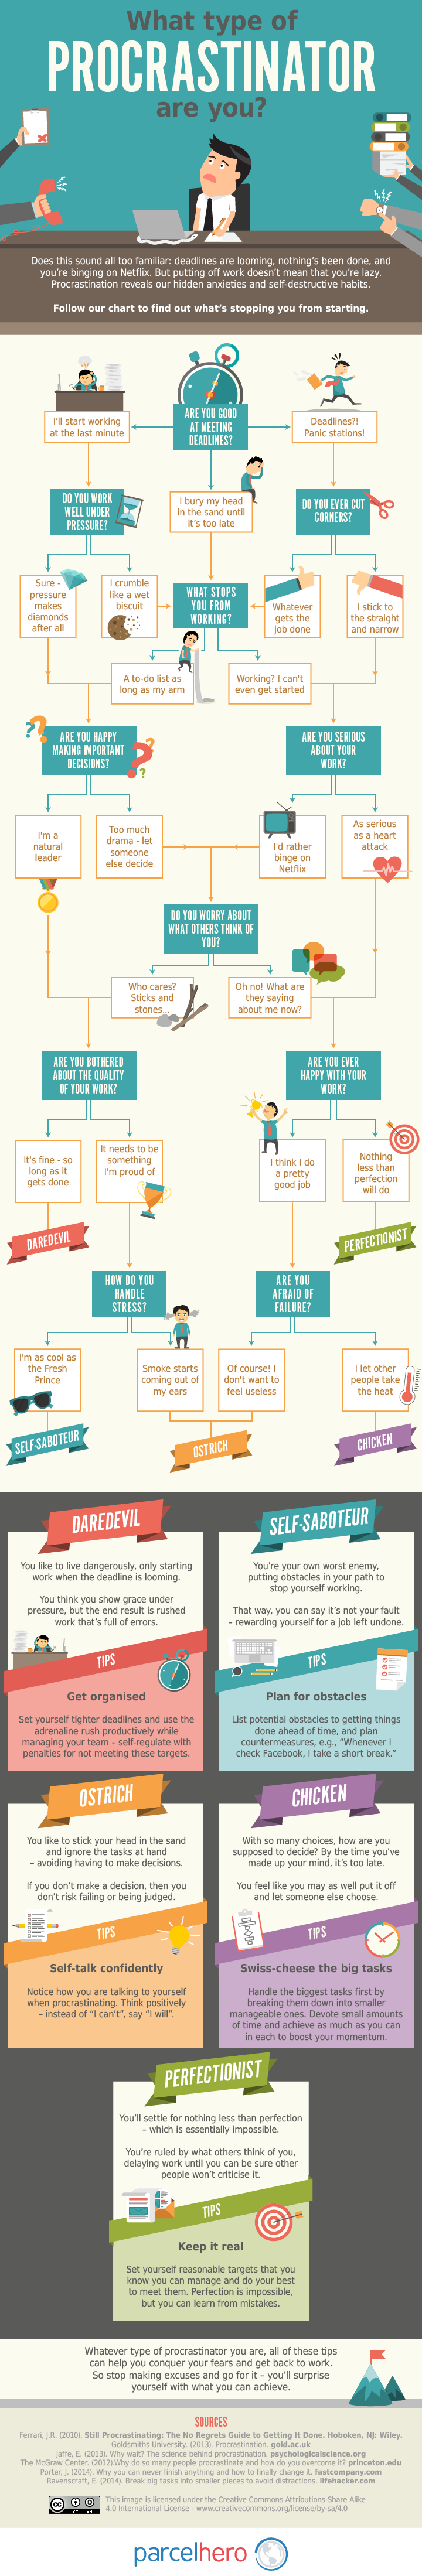 type-of-procrastinator-infographic.png